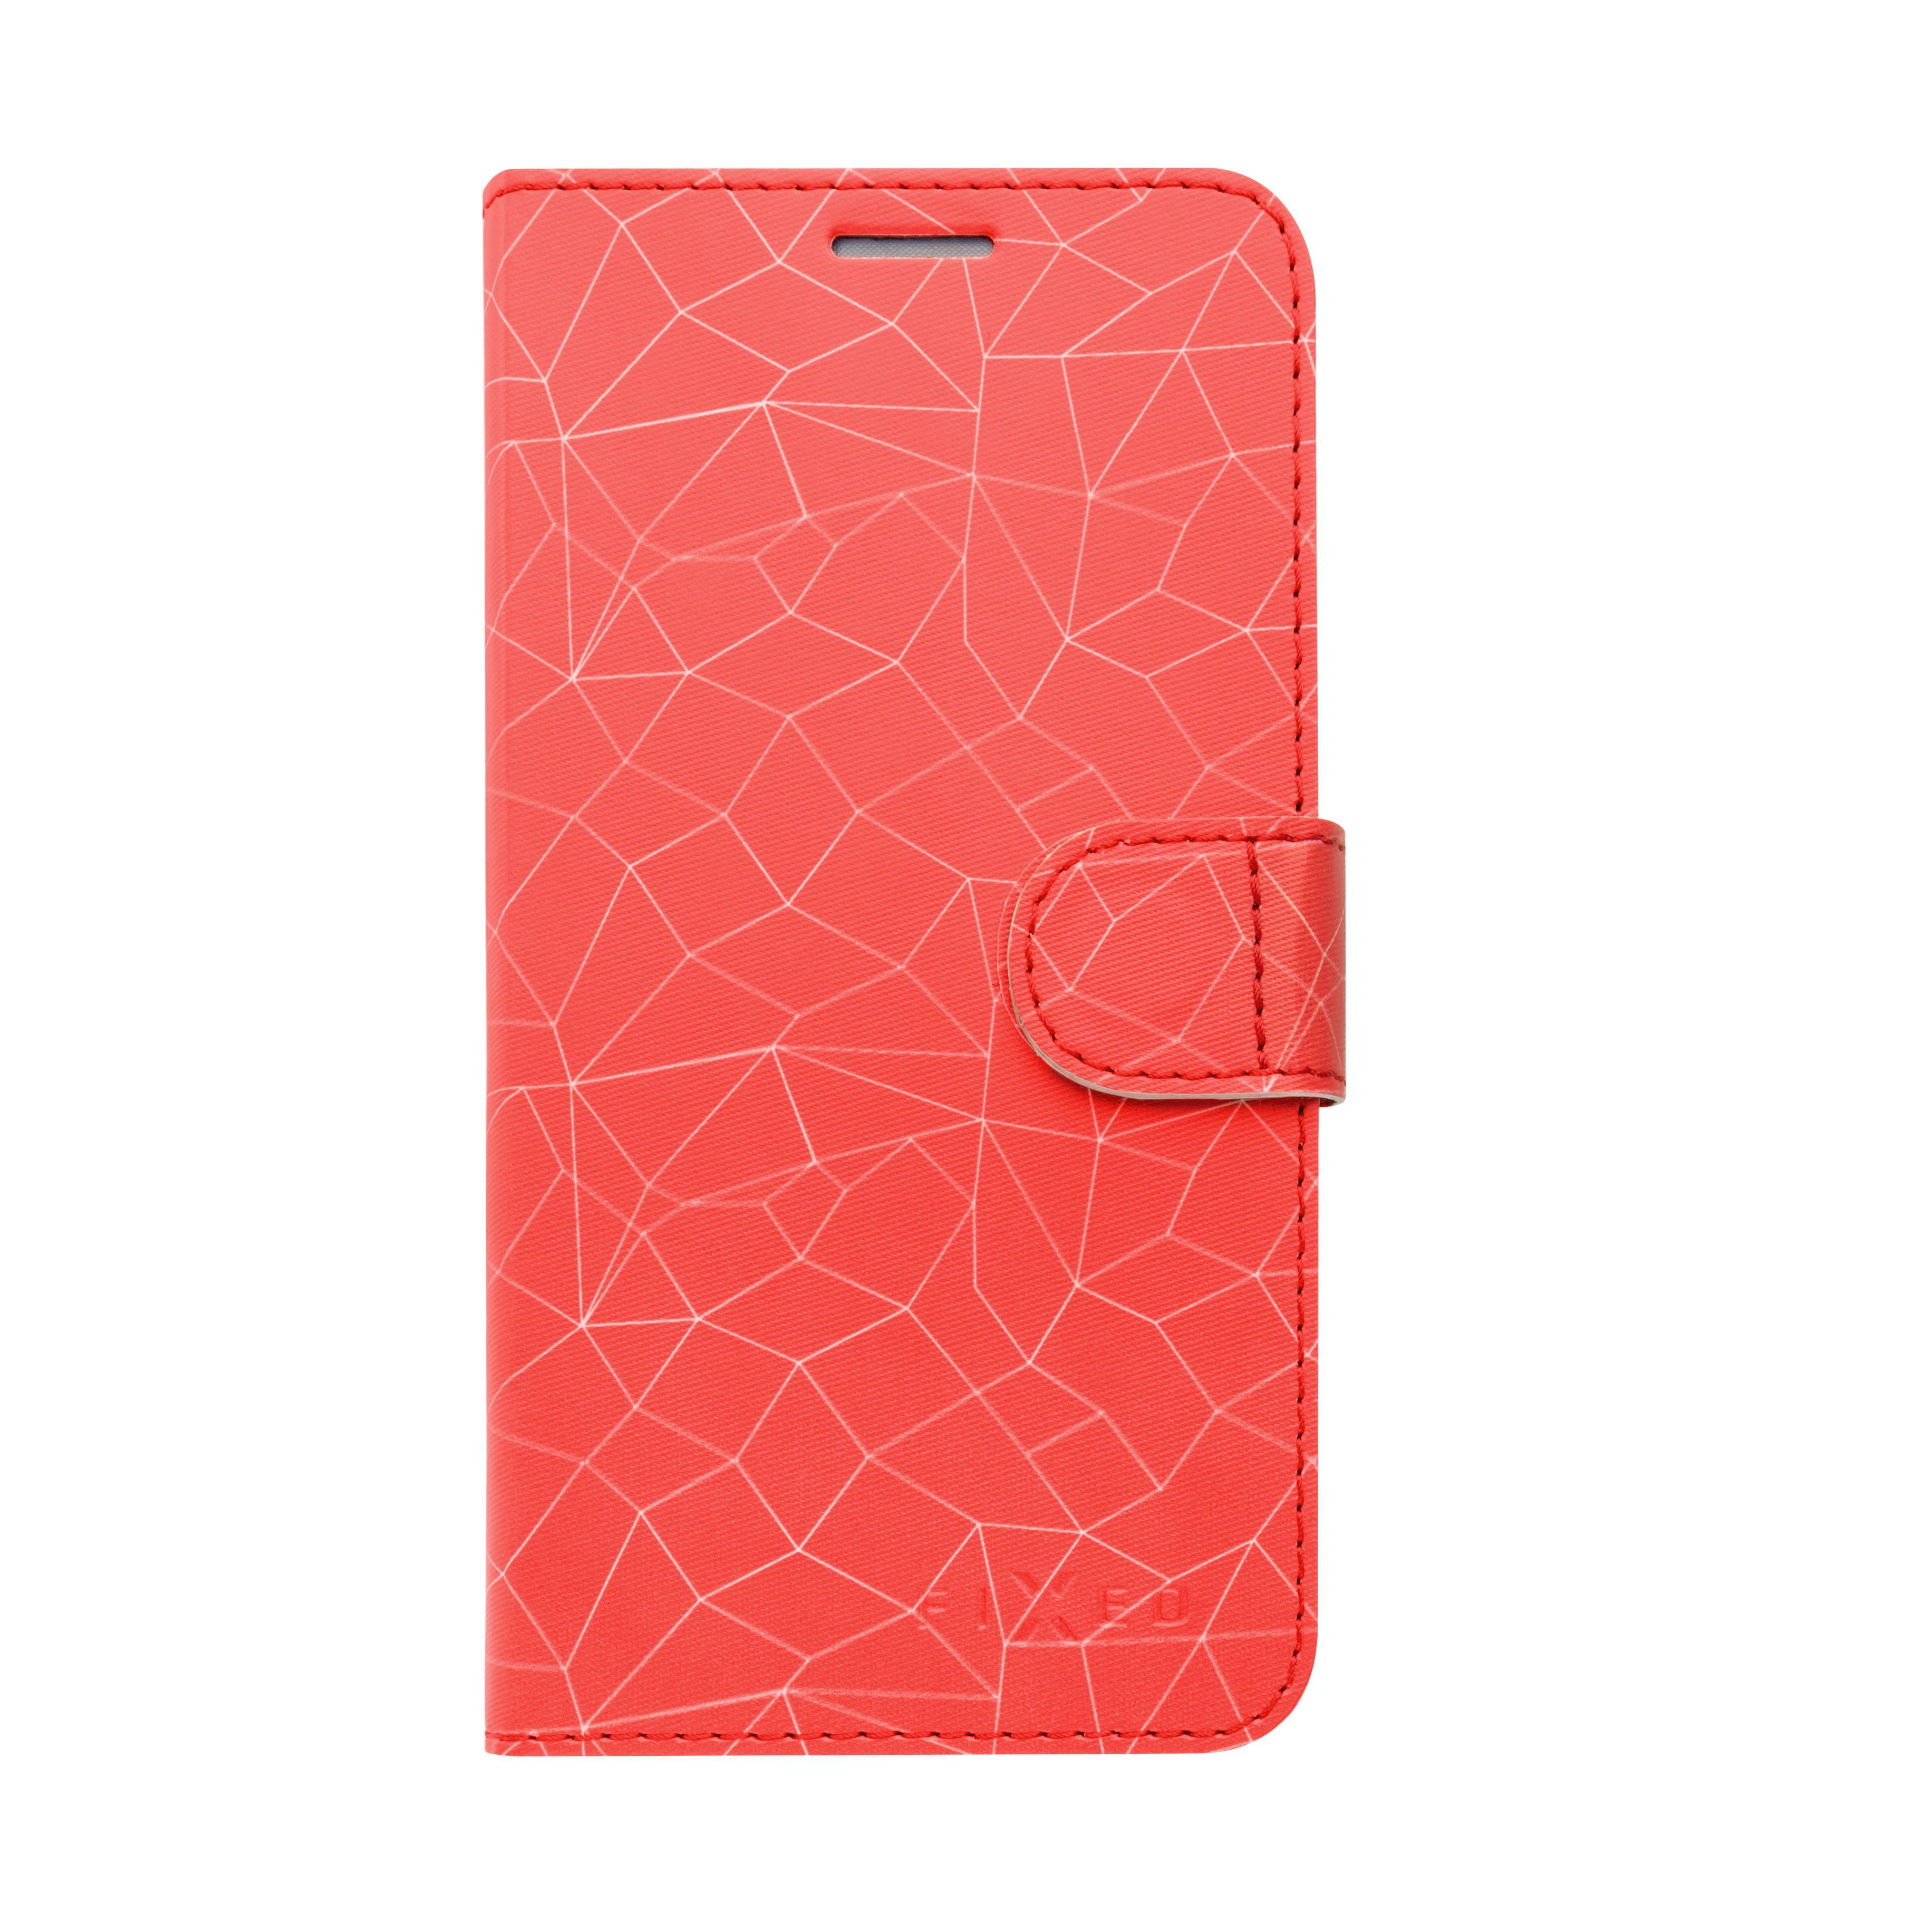 Pouzdro typu kniha FIXED FIT pro Xiaomi Redmi 6, motiv red mesh